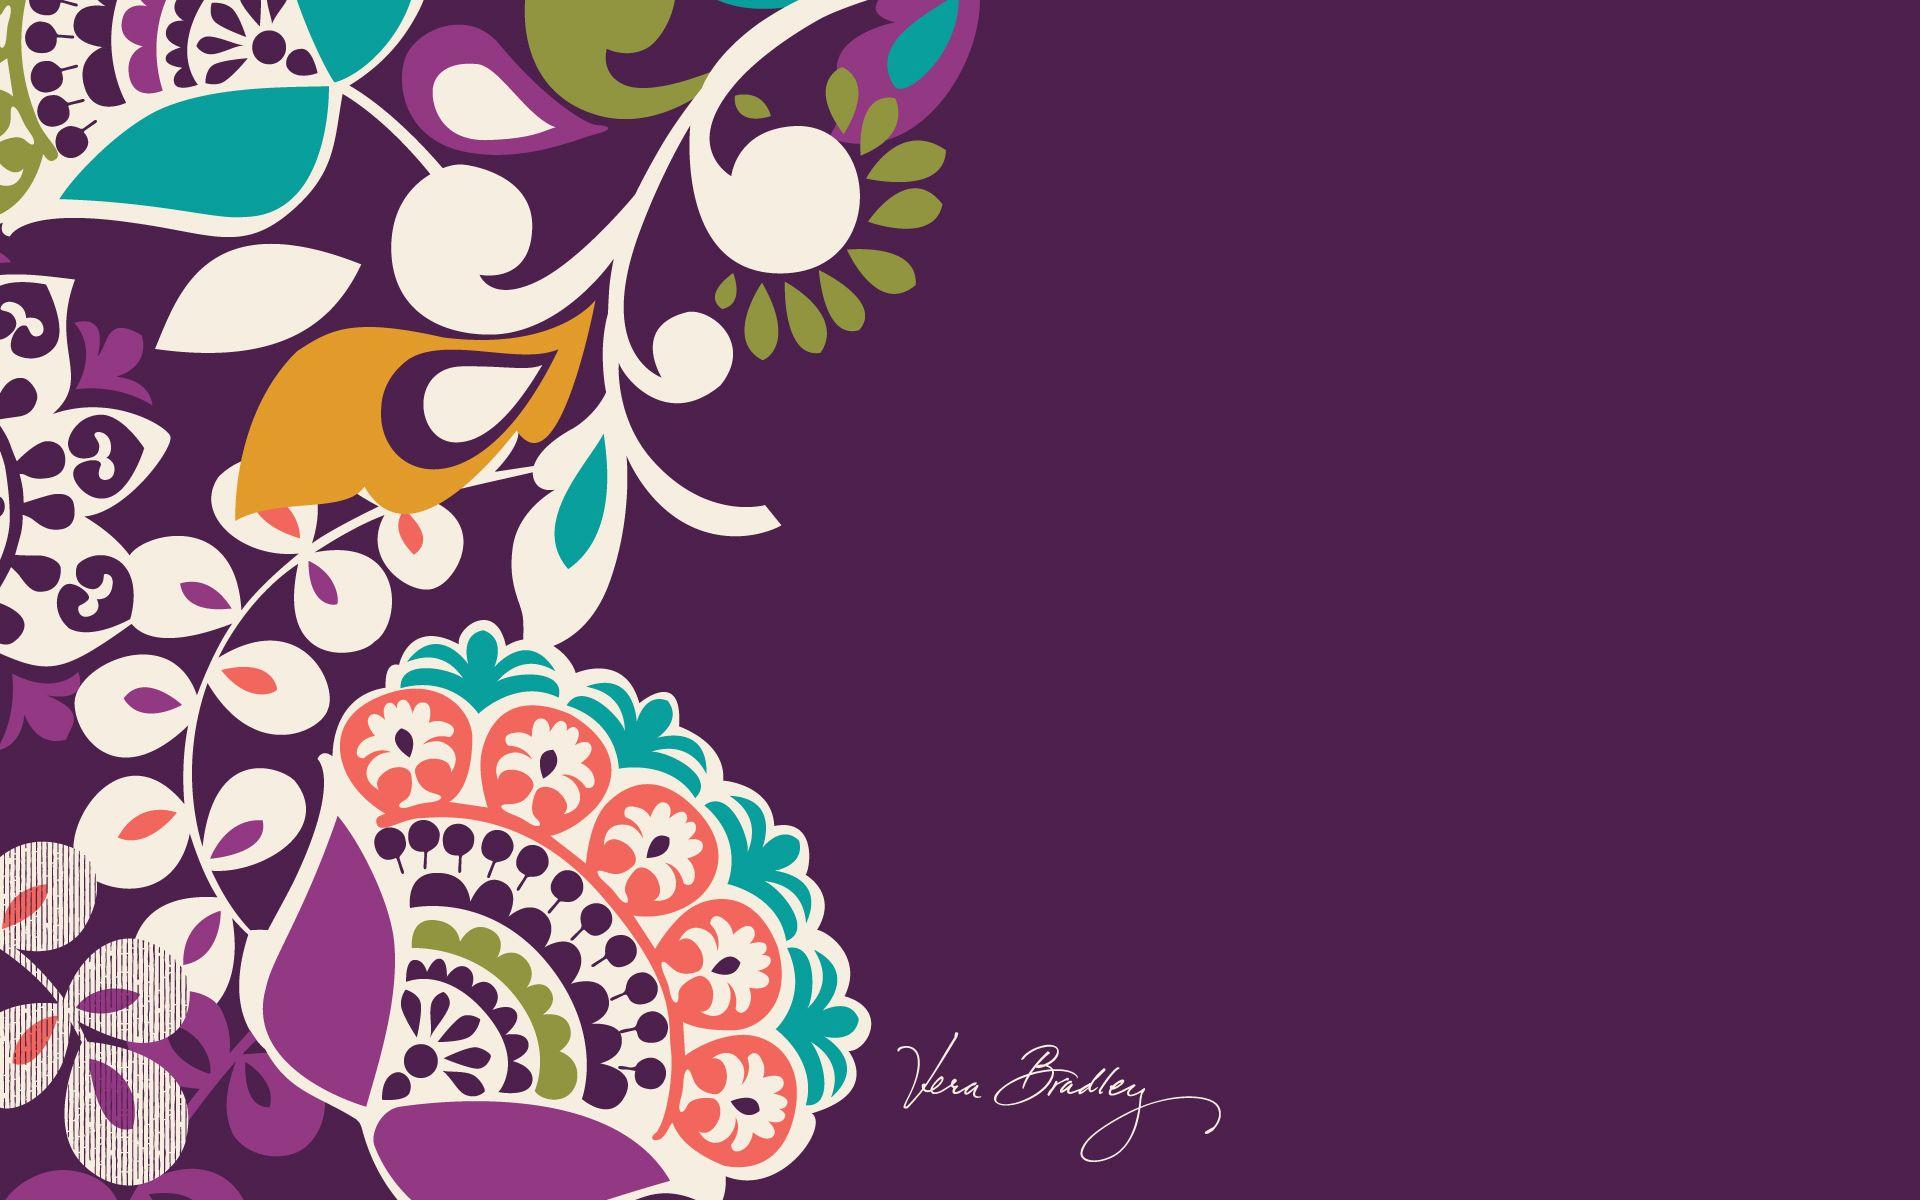 Vera Bradley Downloads page. Downloads of their patterns for desktop ...